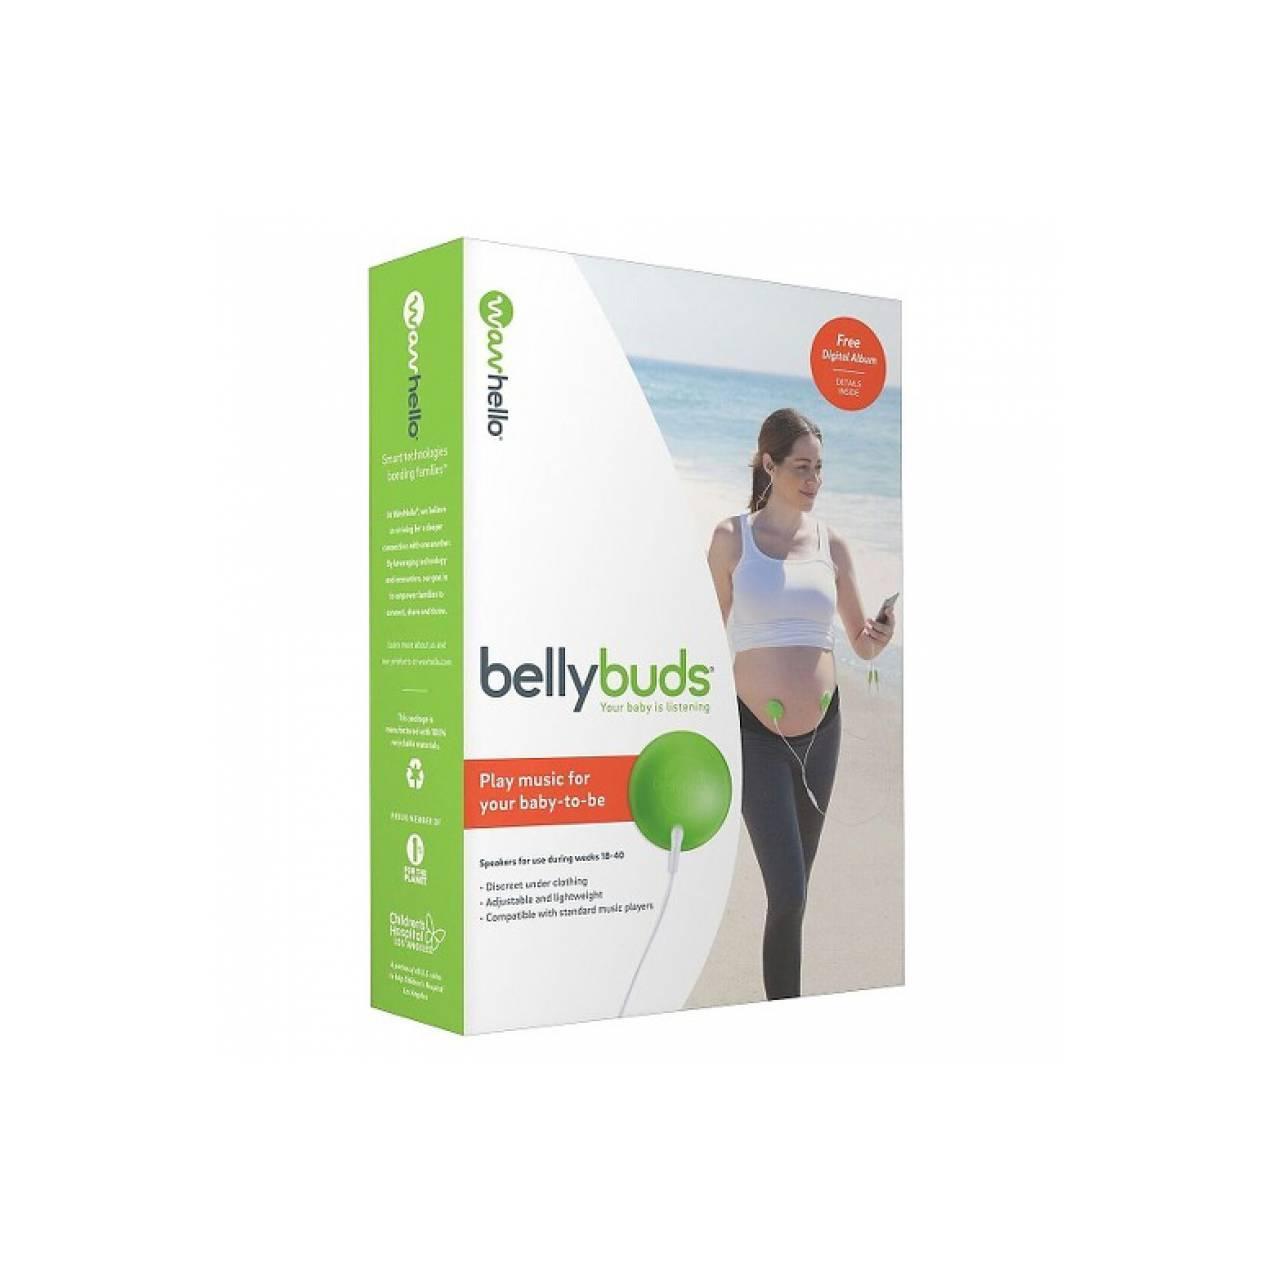 Bellybuds Baby-Bump Sound System